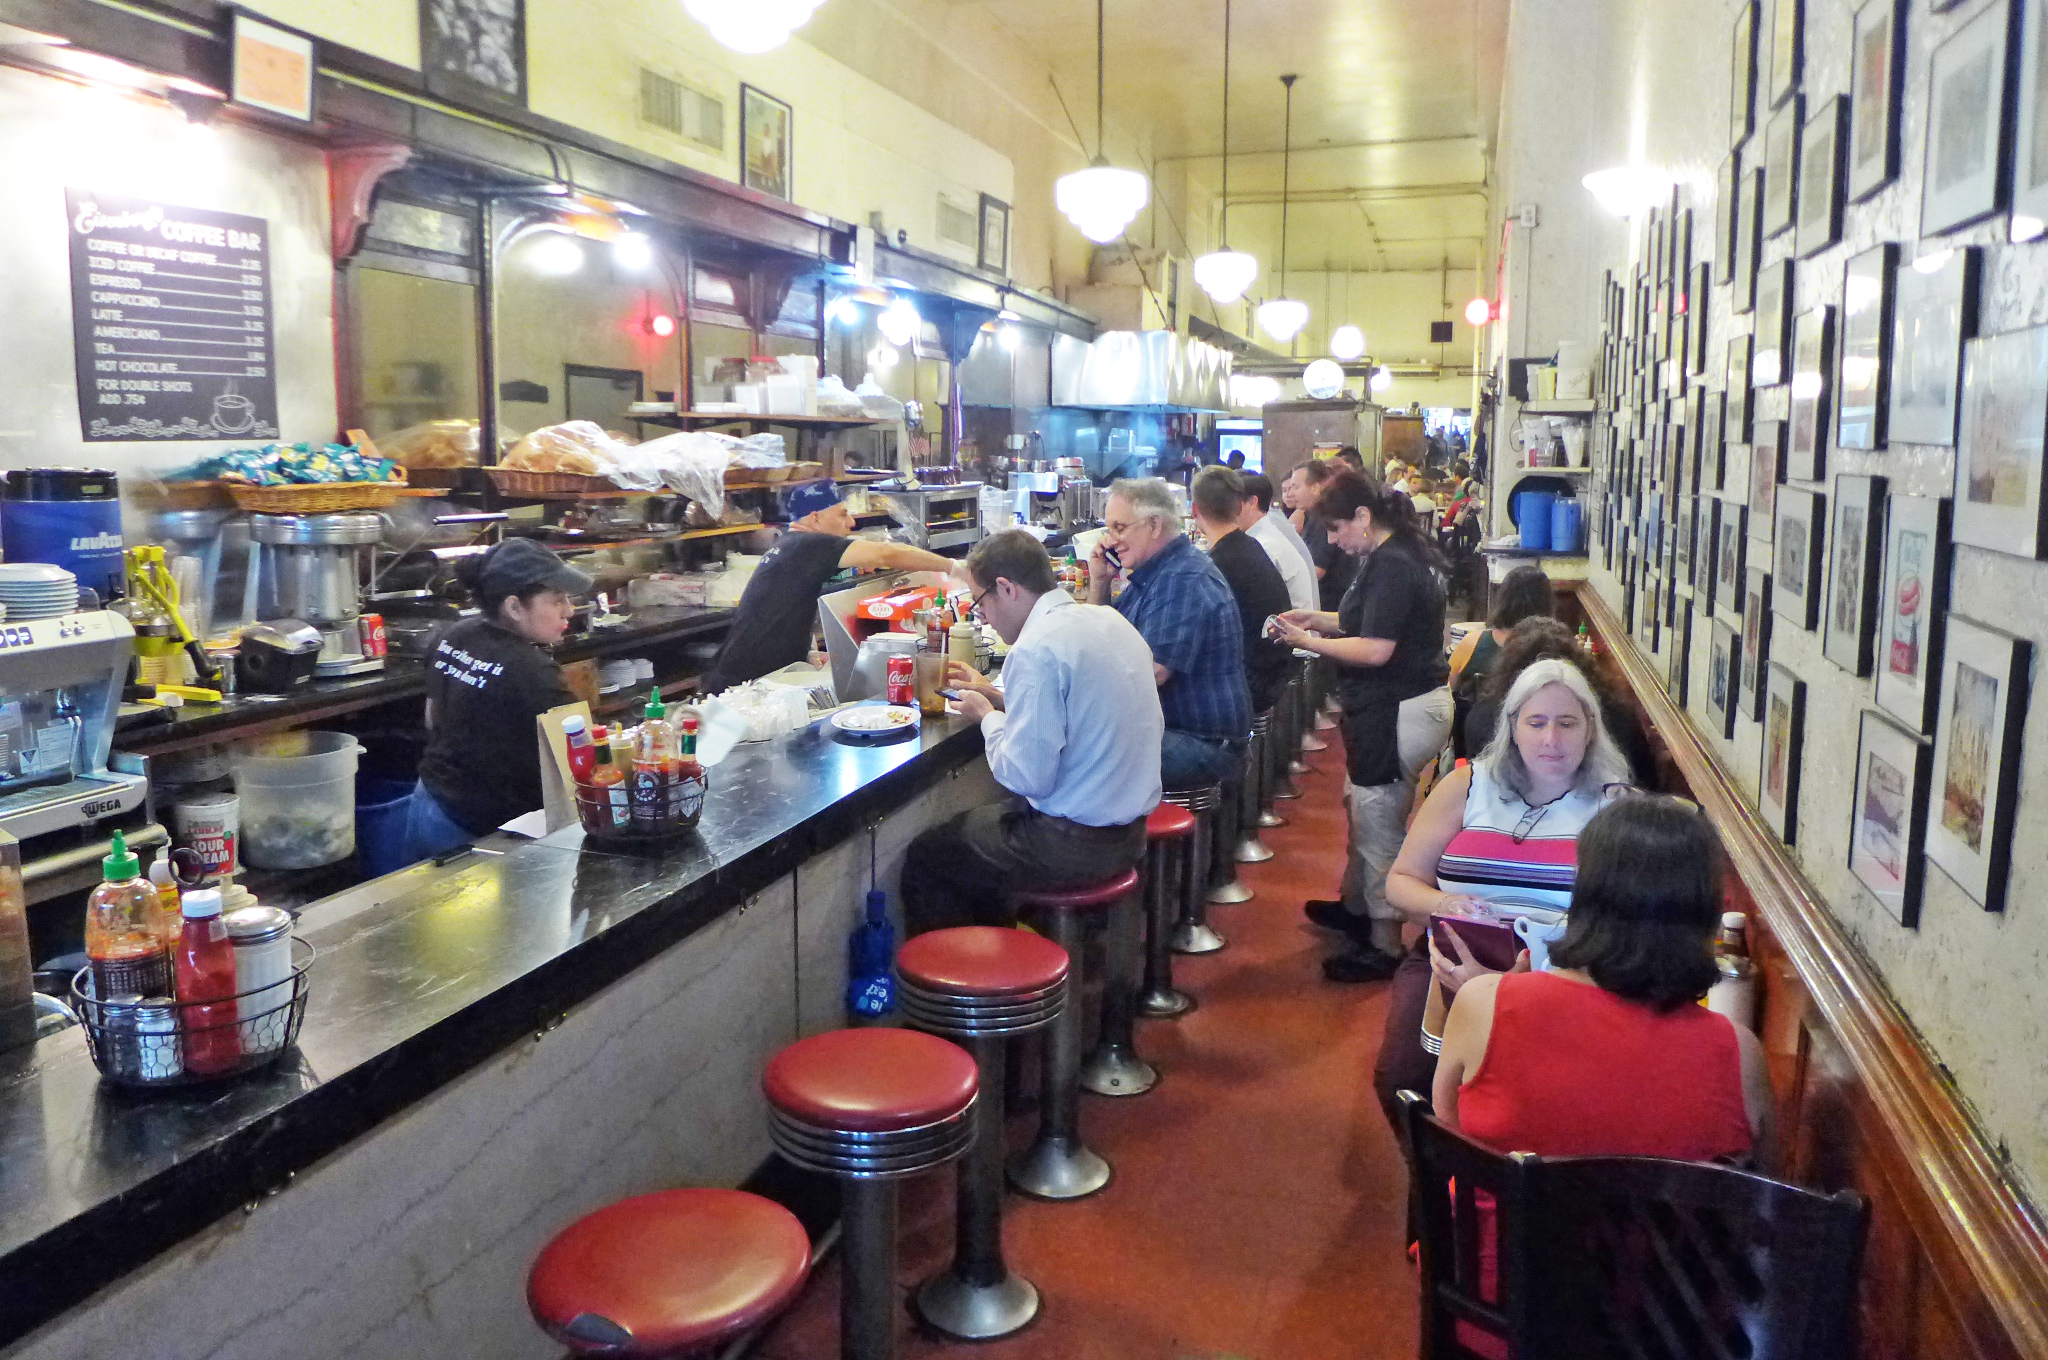 An Enduring Old-School Sandwich Shop Still Serves a Mean Tuna Sandwich